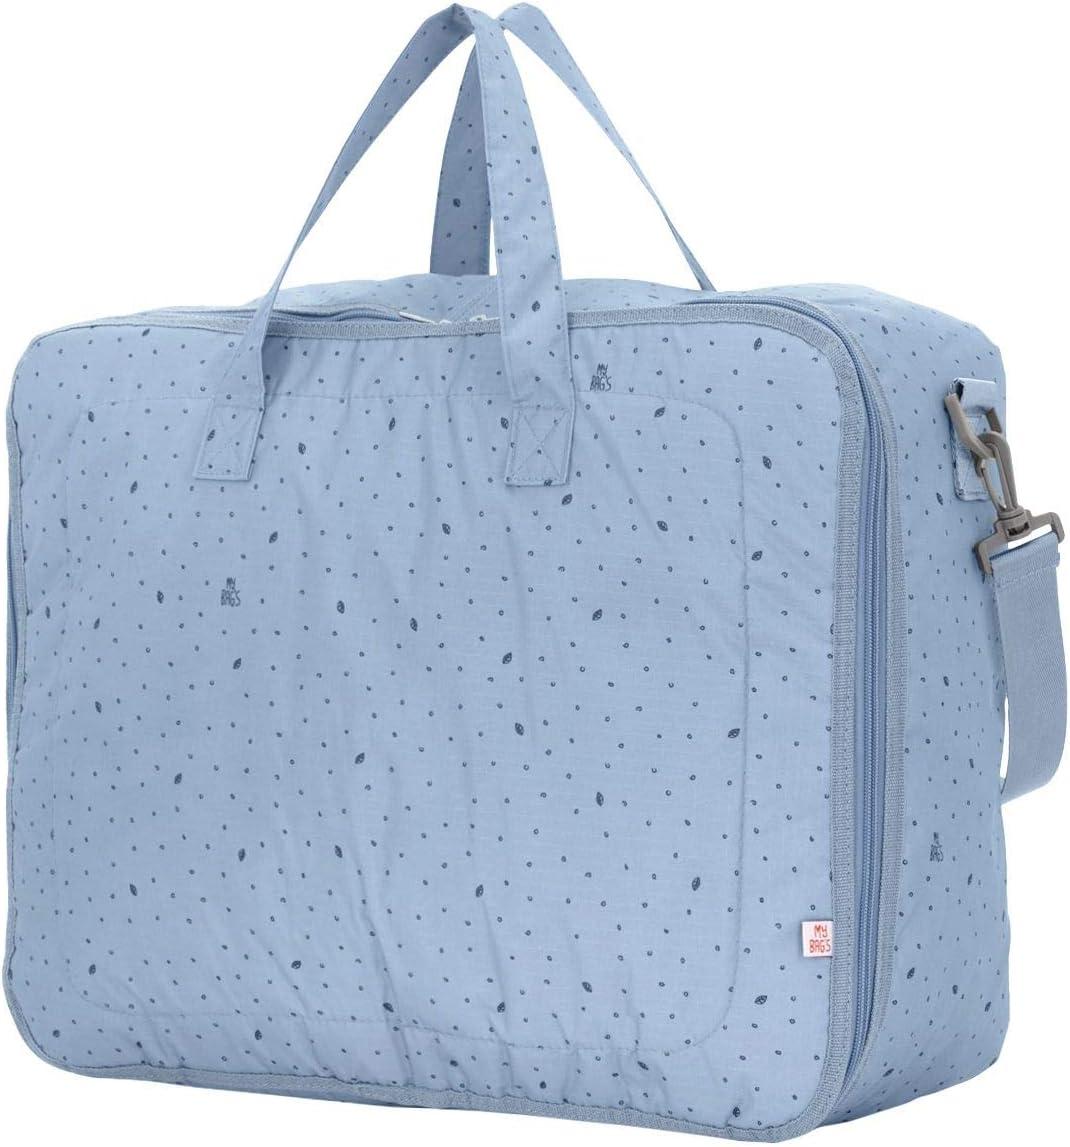 Danielstore Azul petr/óleo My Bags-Maleta Bebe Leaf